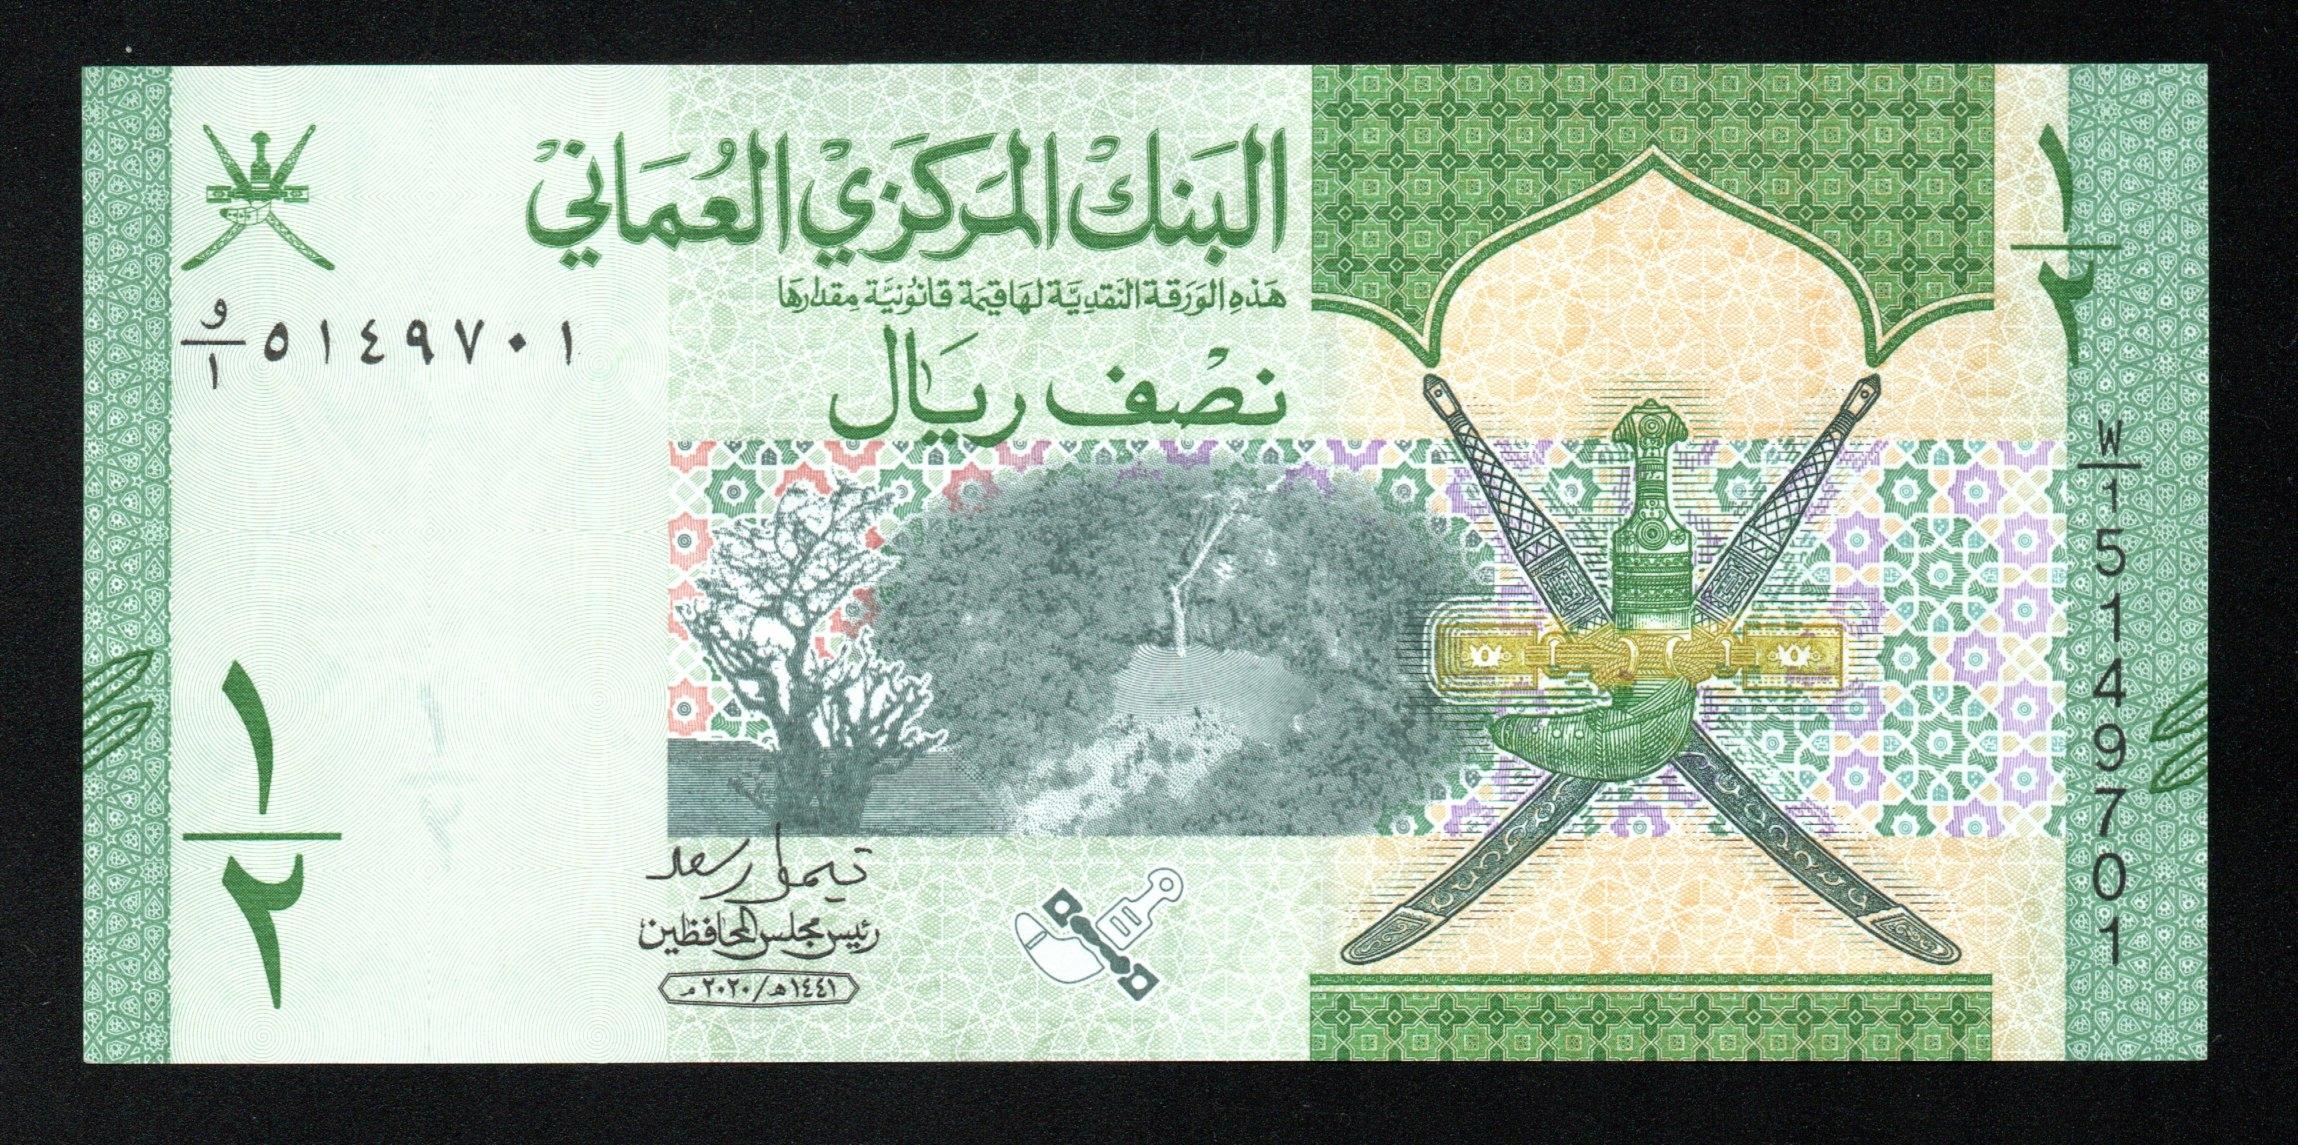 Оман 1/2 RIAL P-новый UNC 2020 W / 1 серии